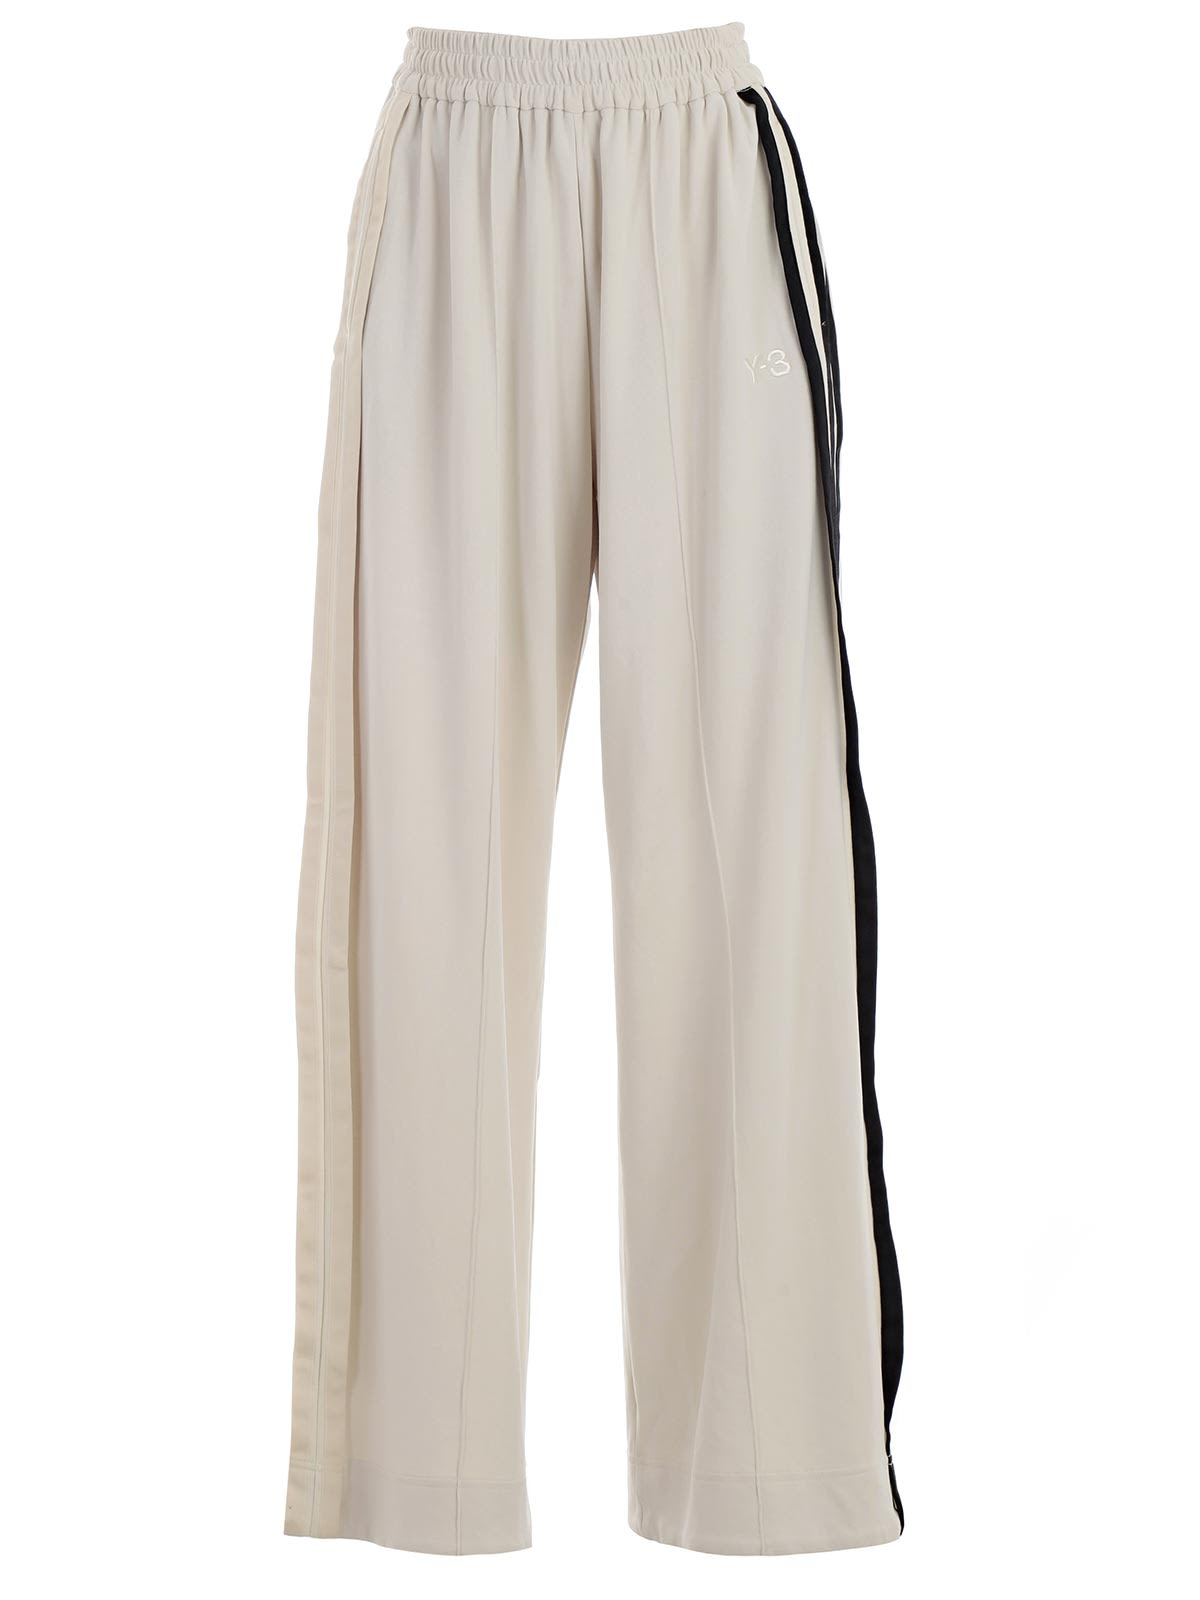 y-3 -  Striped Wide Leg Track Pants